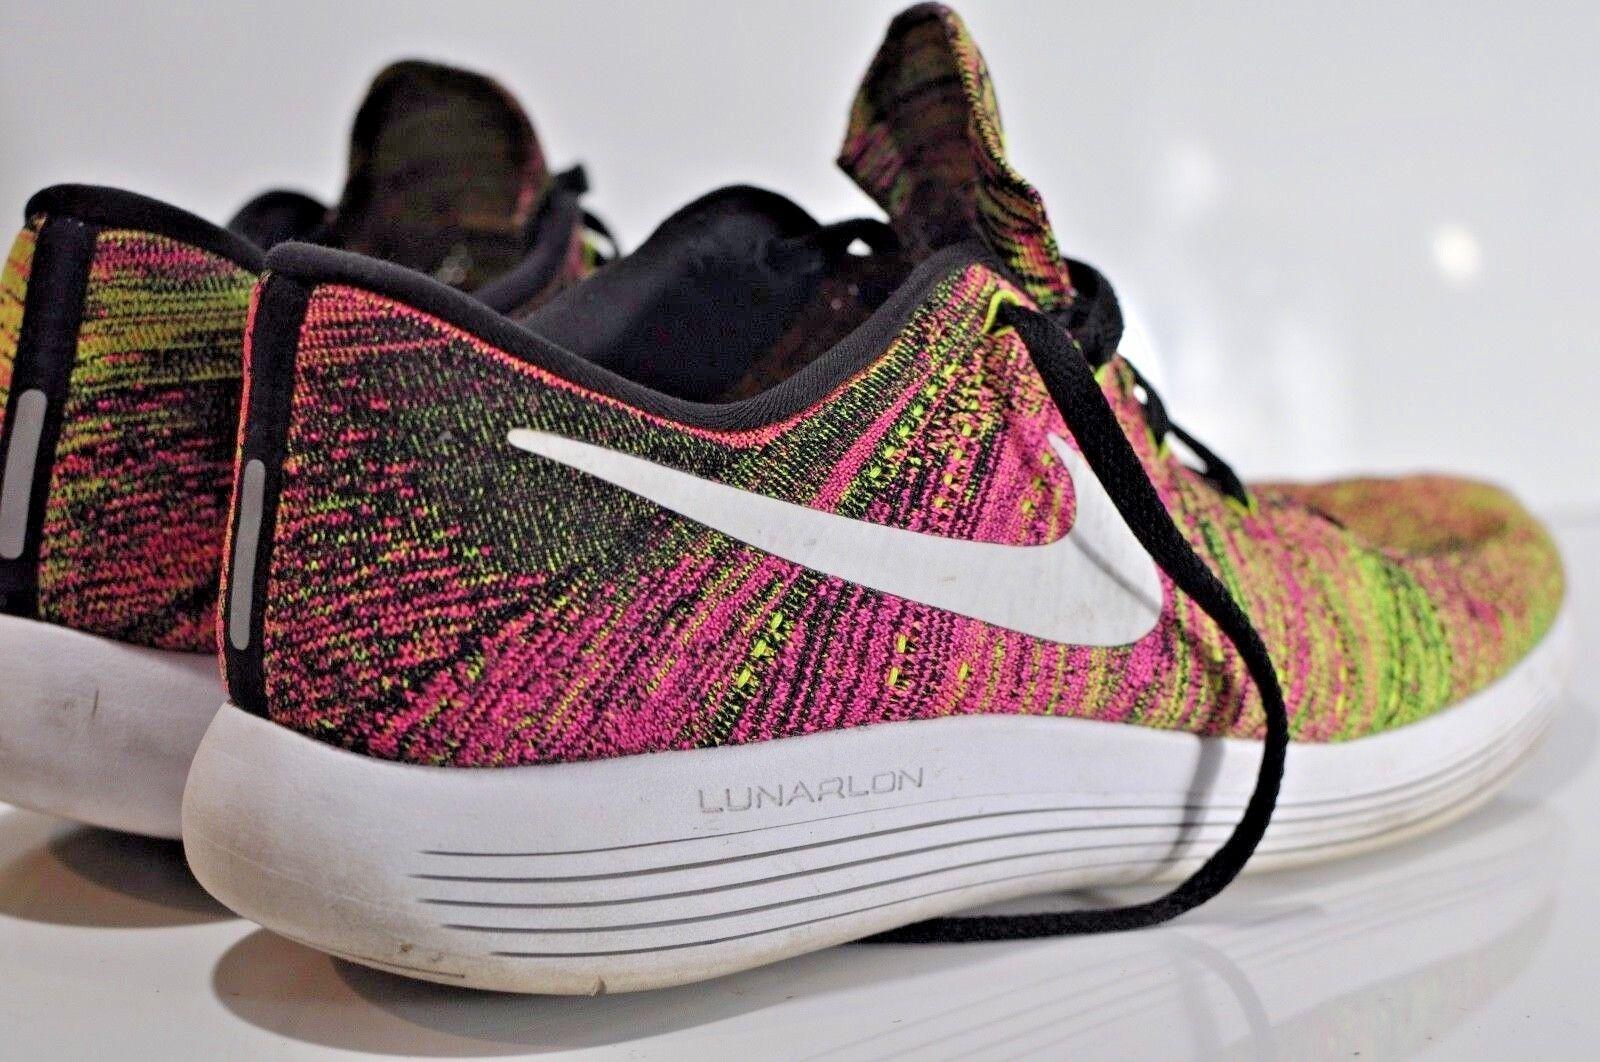 Nike Lunarepic Flyknit lunarlon Mens 11.5 shoes